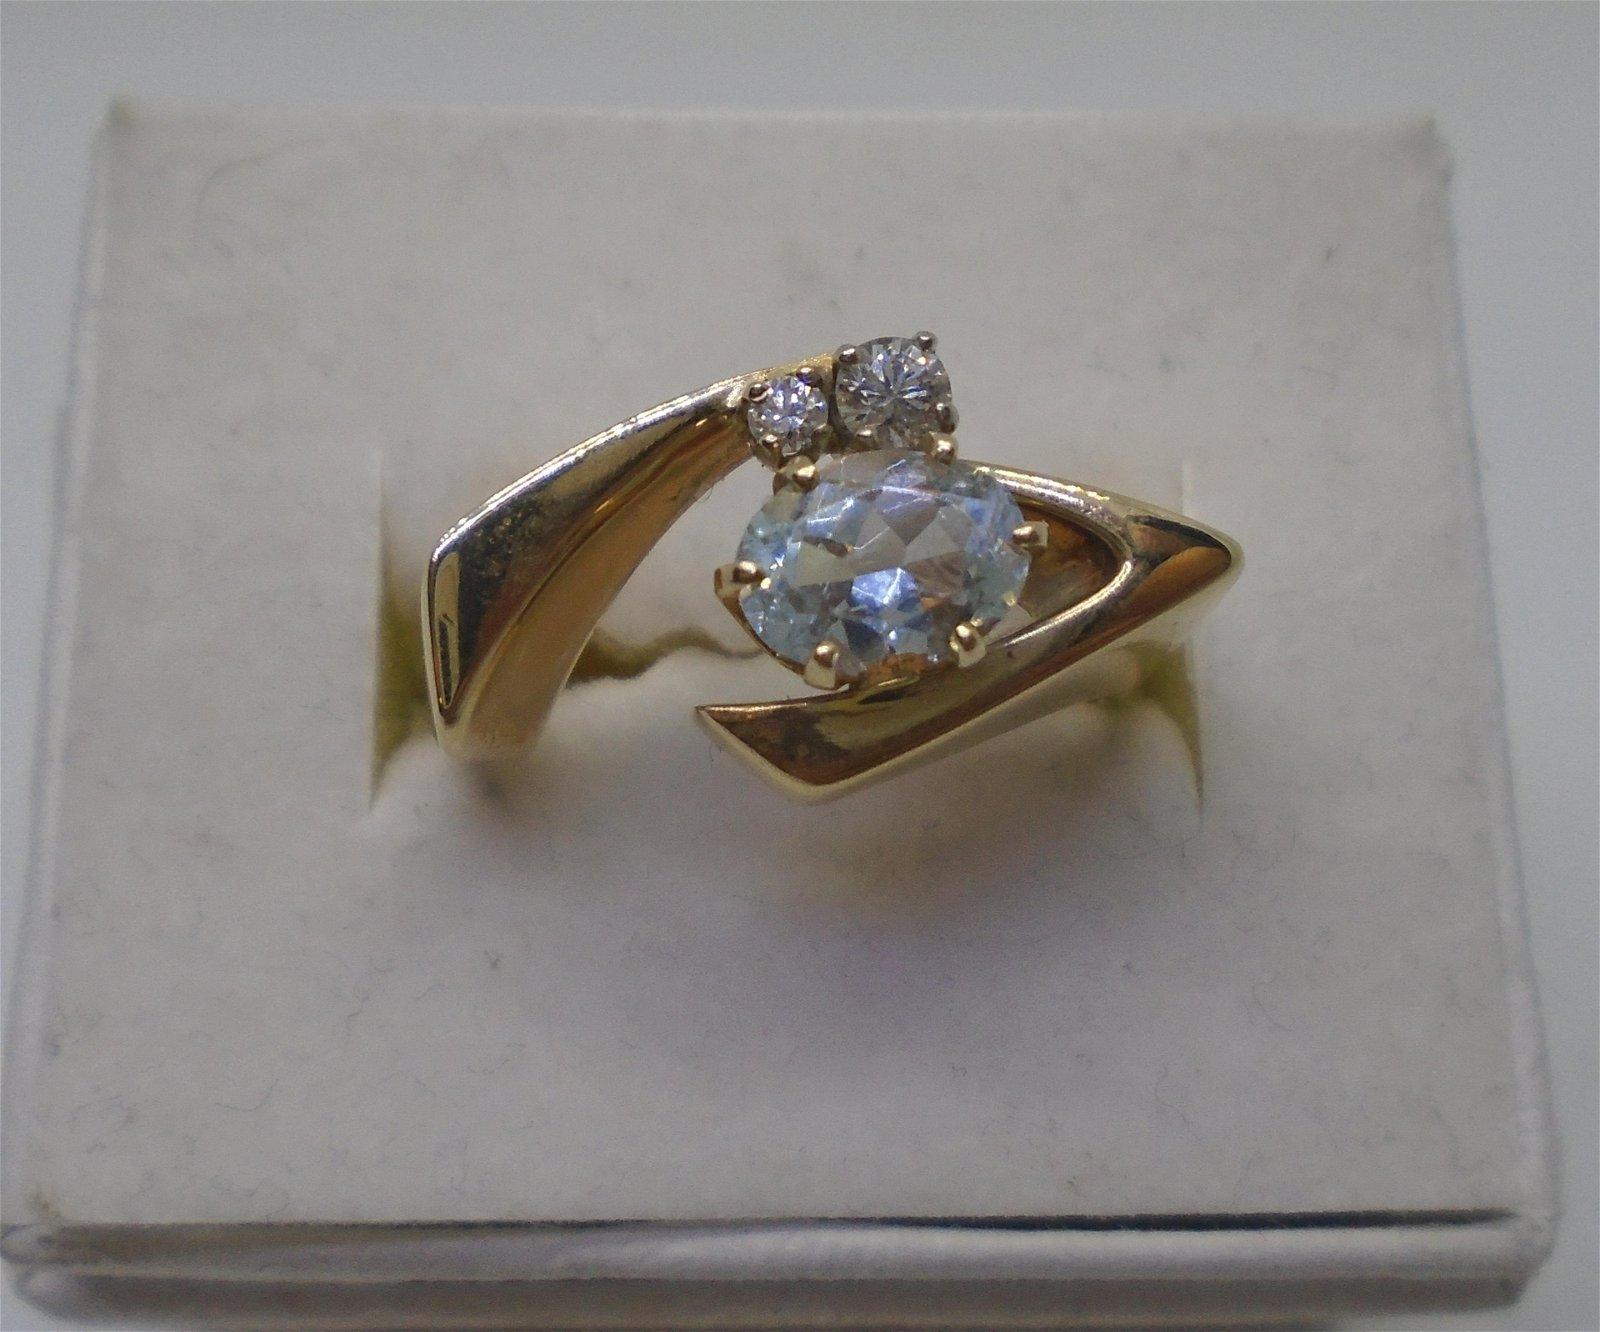 AQUAMARINE DIAMOND RING 14K GOLD VINTAGE ESTATE